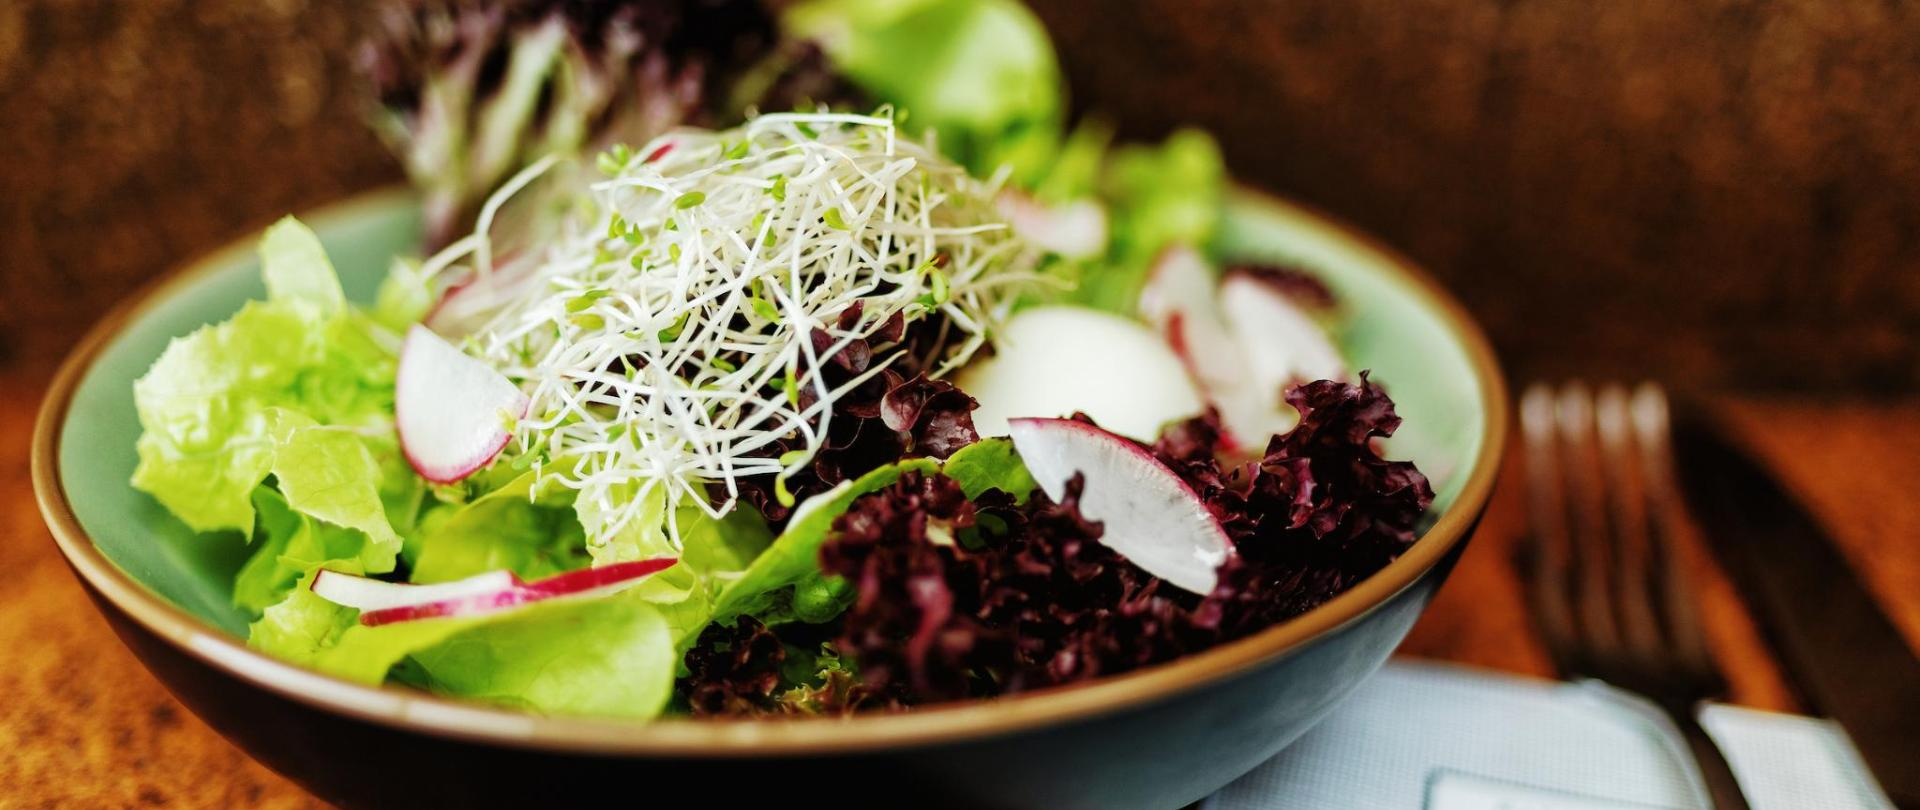 Salat groß.jpg